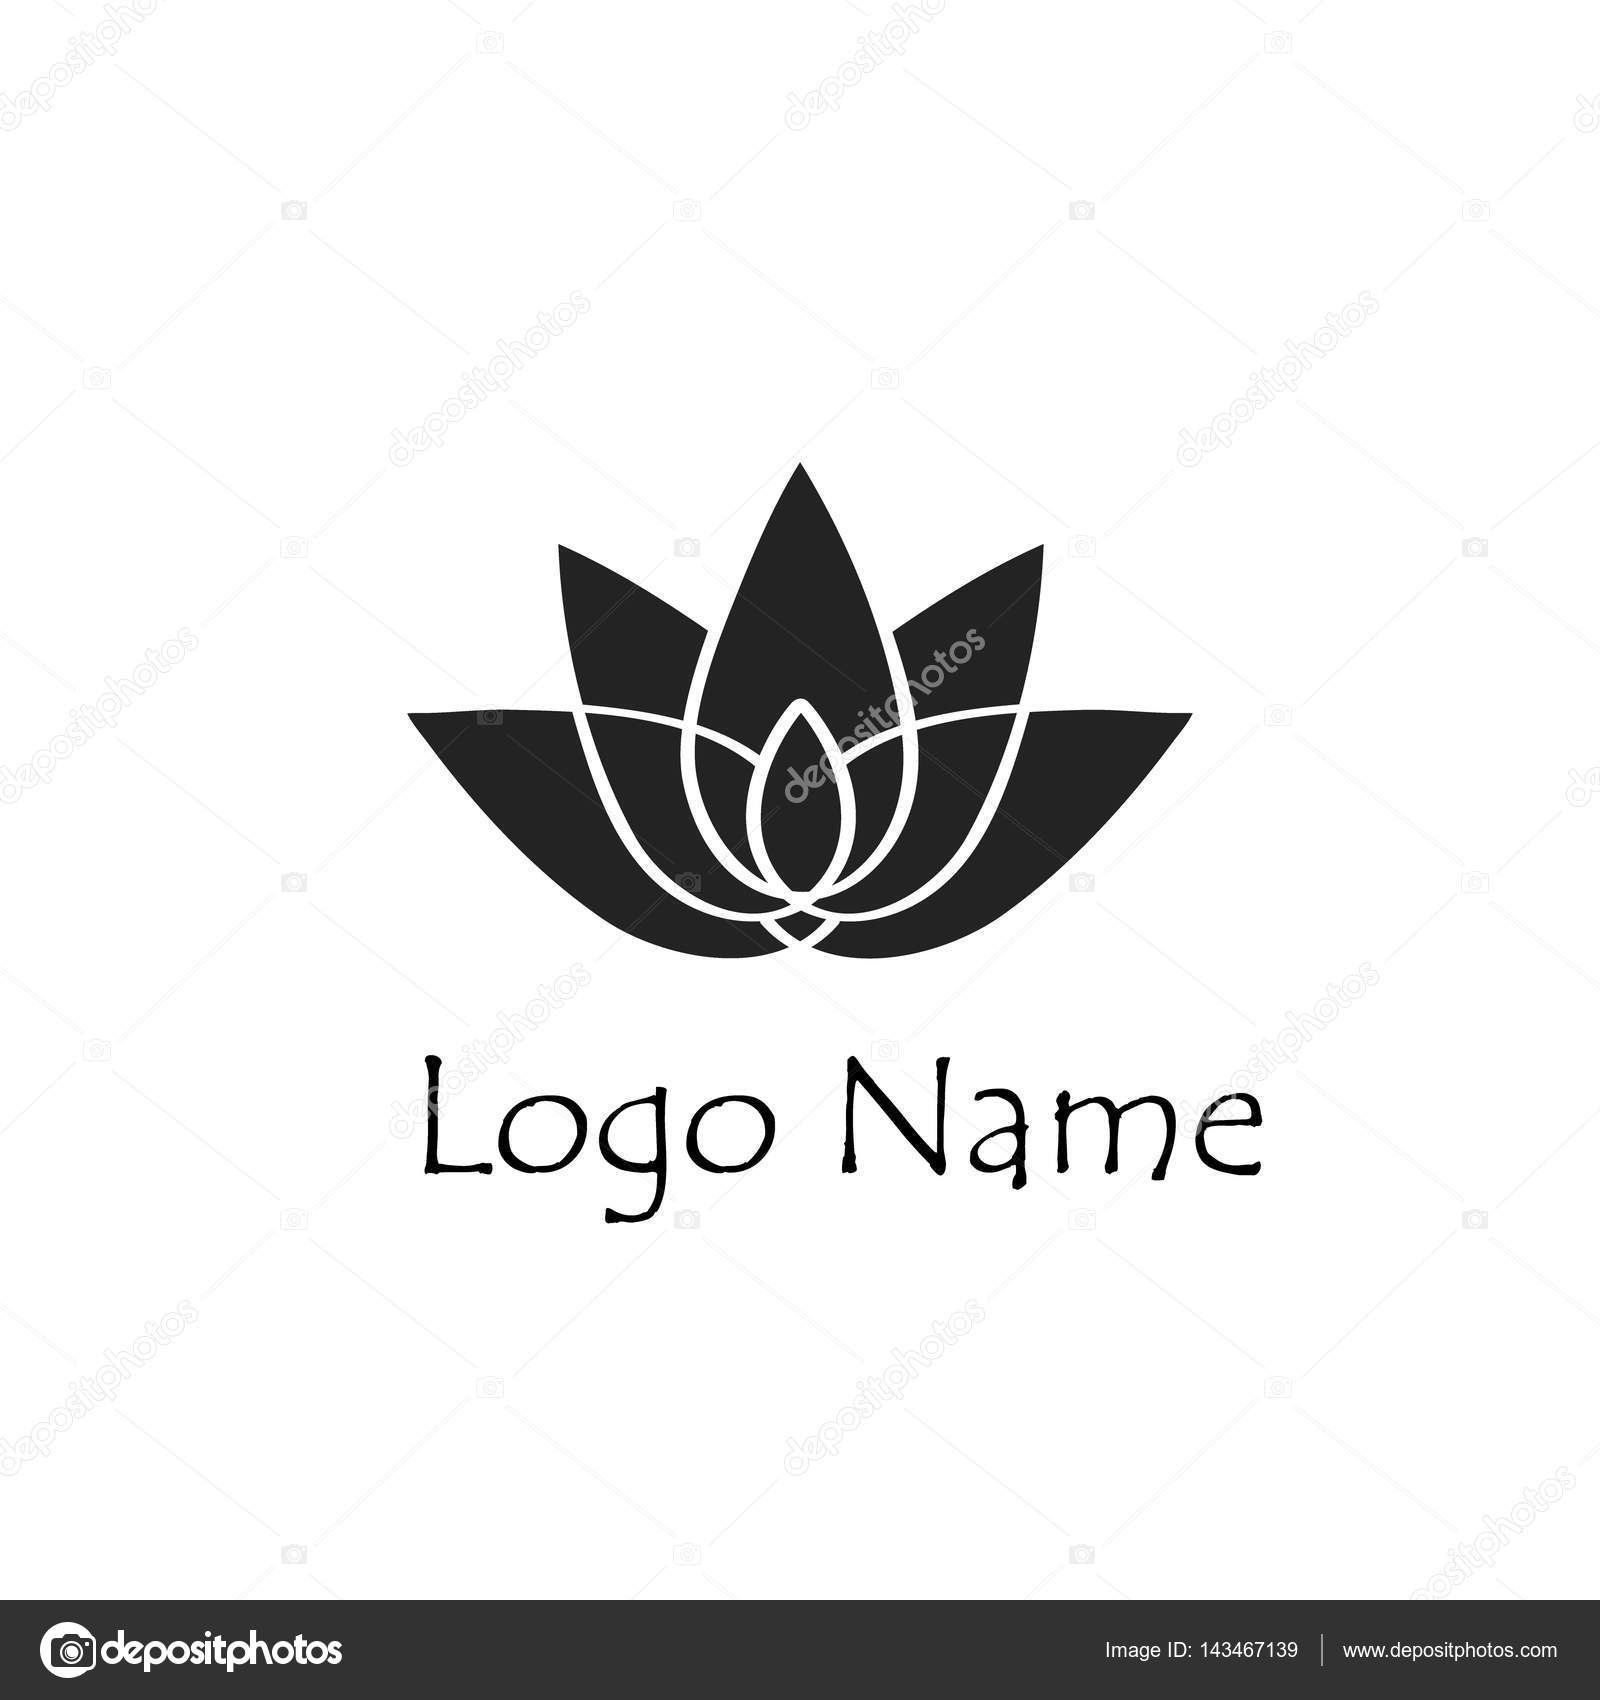 Lotus flower logo stock vector annaboro 143467139 lotus flower logo stock vector mightylinksfo